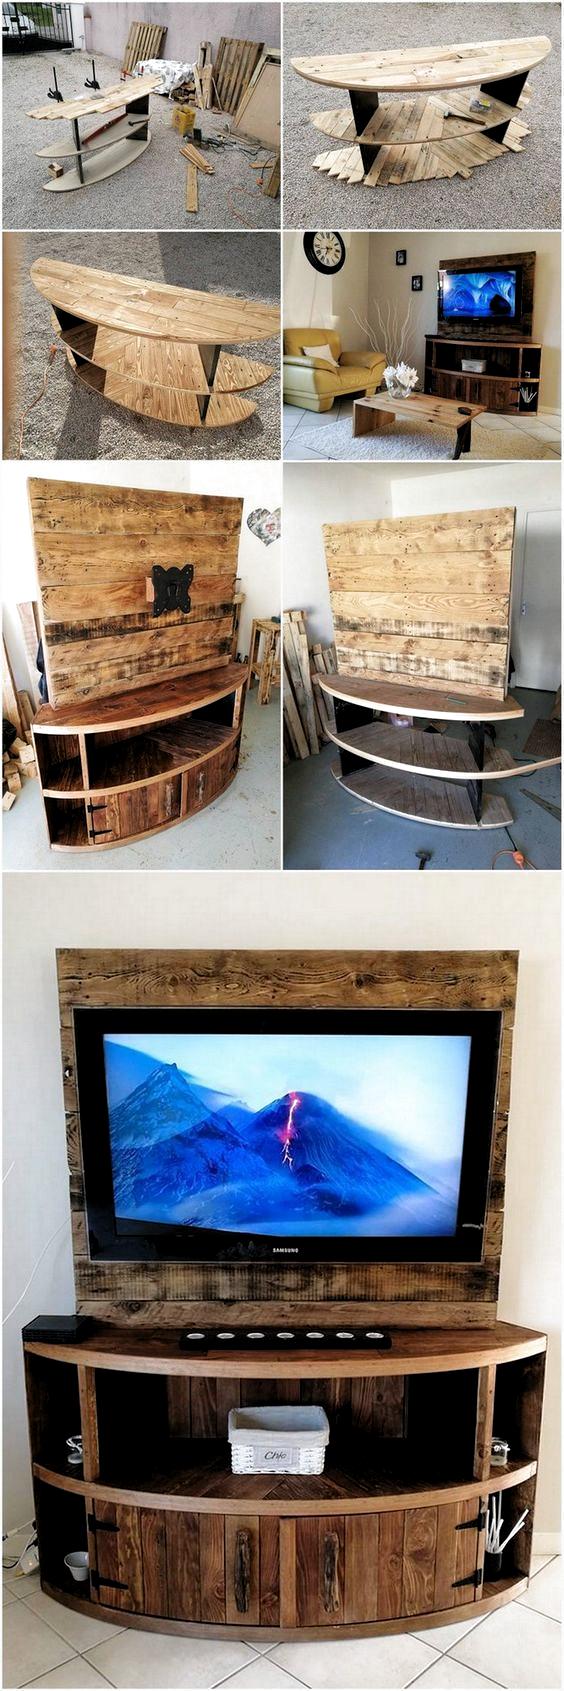 10 Best Doable DIY TV Stand Ideas   #DIY #TVStandsIdeas #TV #Television #Stands